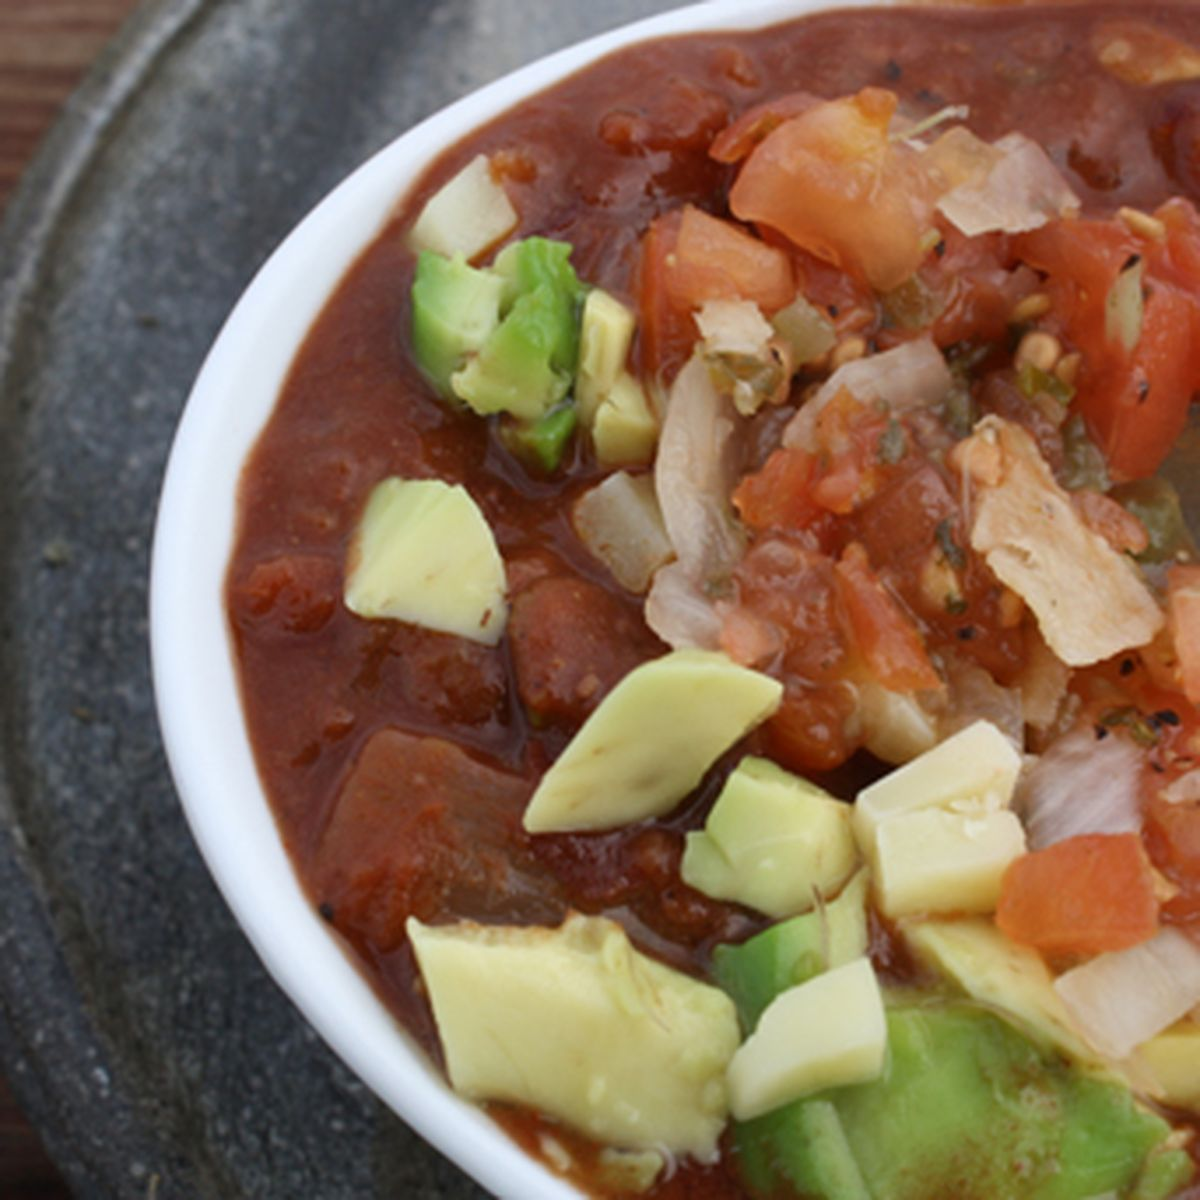 Crockpot Vegetarian Chili With Chocolate Recipe On Food52